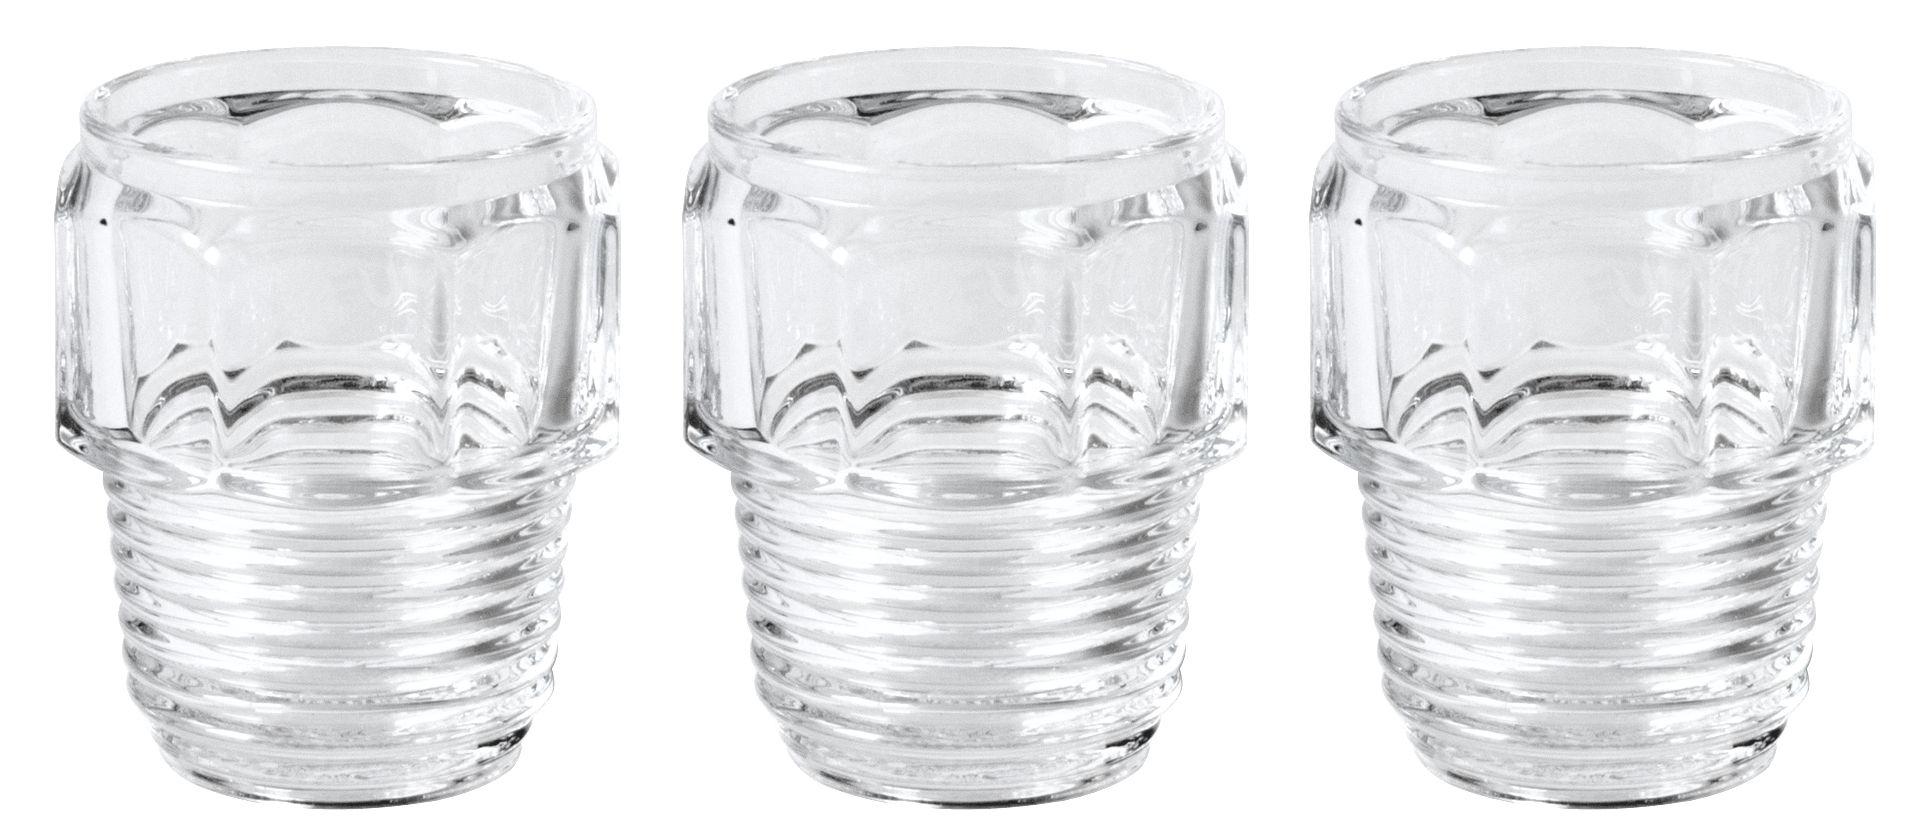 Tavola - Bicchieri  - Bicchiere Machine Collection - / H 10 cm - Set da 3 di Diesel living with Seletti - H 10 cm / trasparente - Vetro